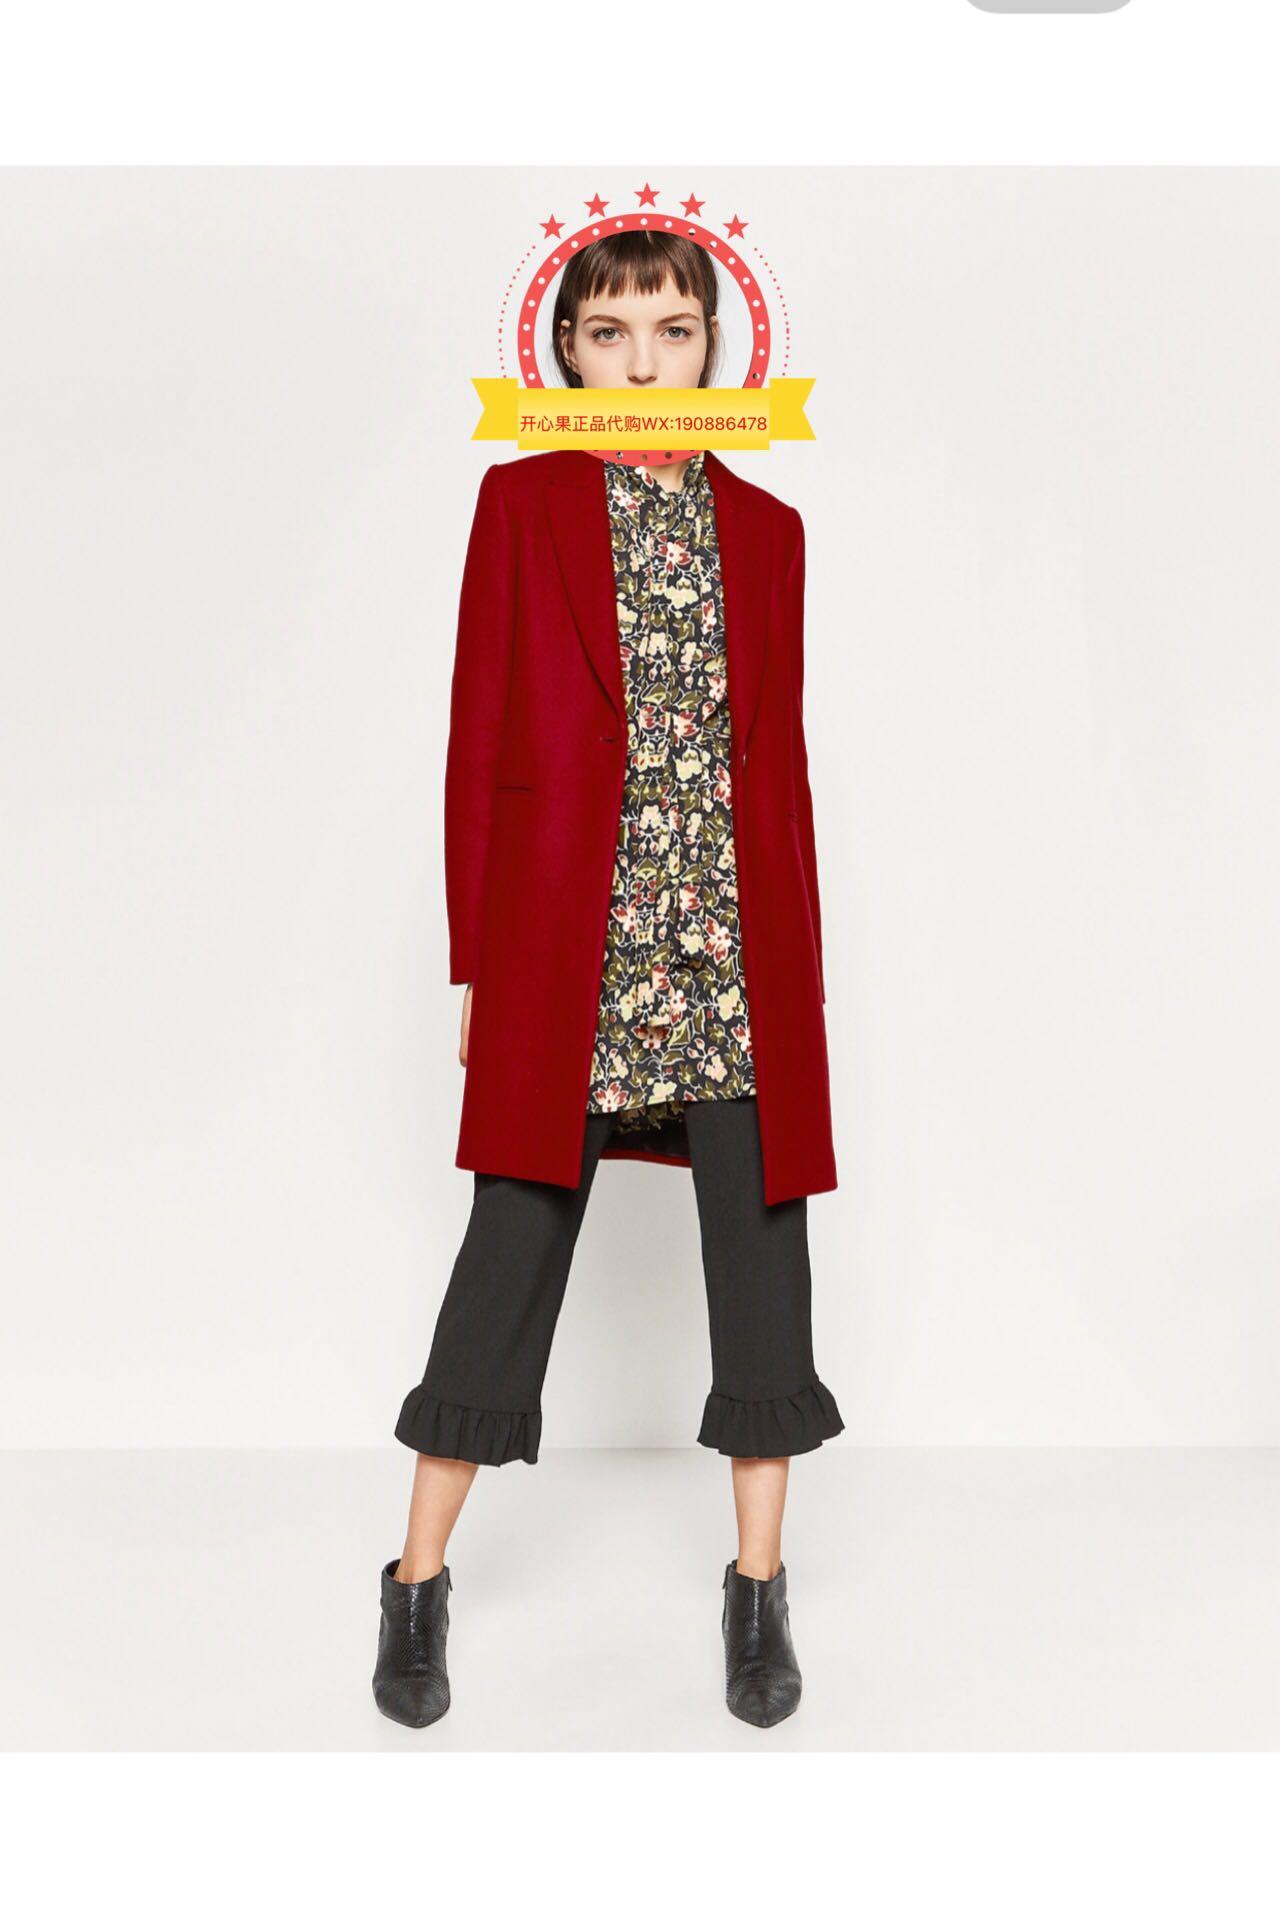 женское пальто ZARA 7949/744 7949744 ZARA